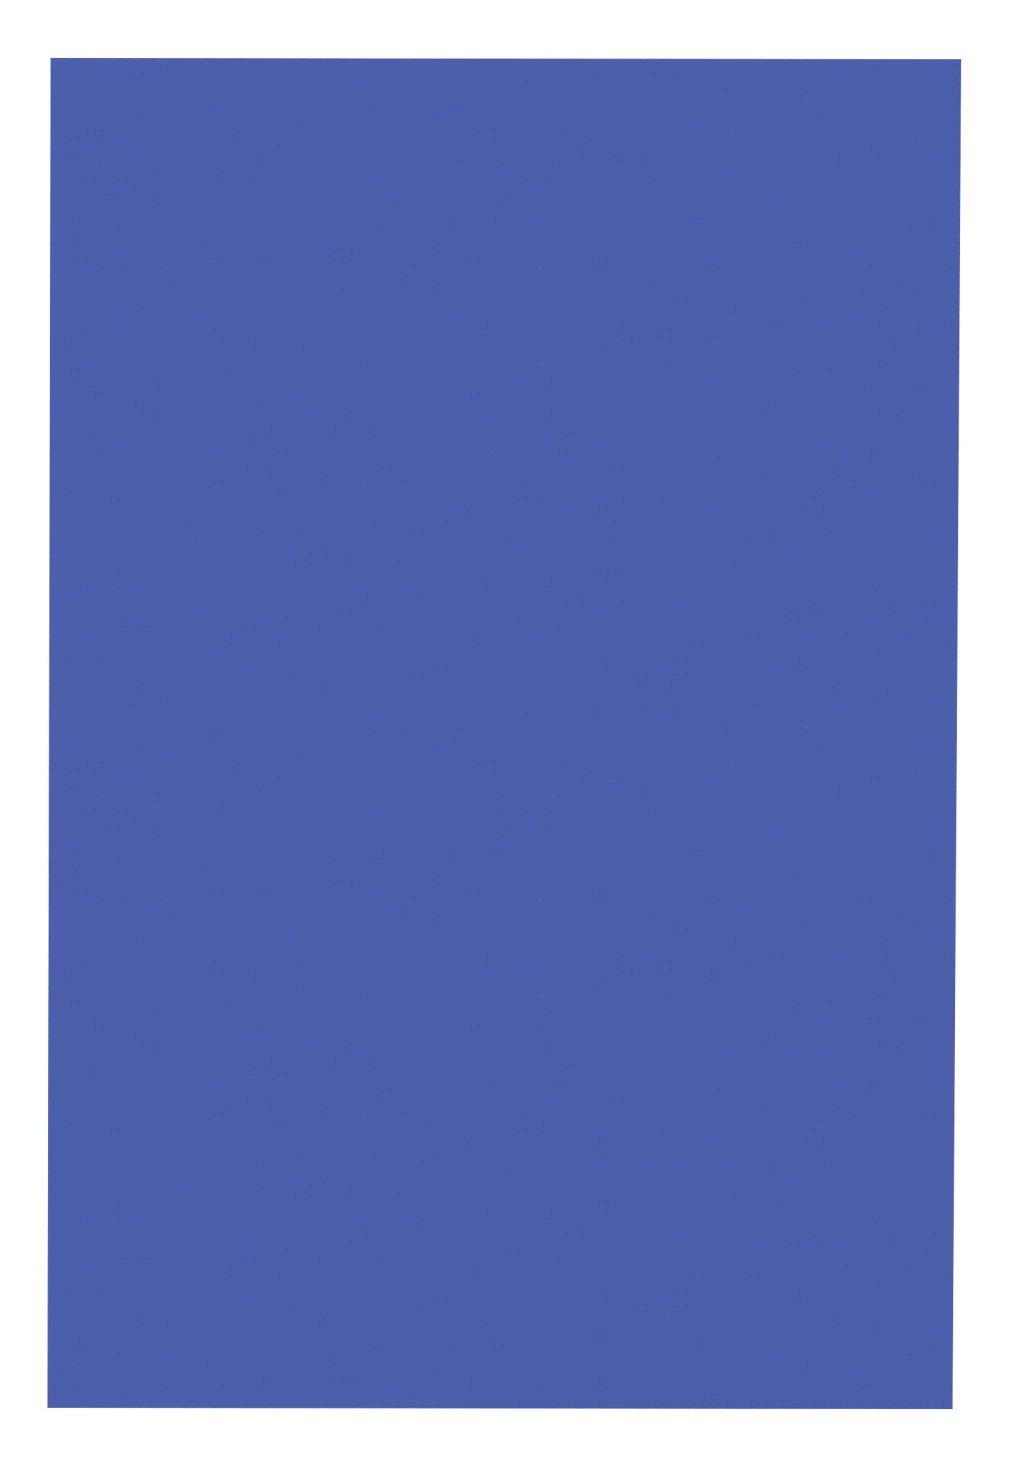 School Smart 1485733 Railroad Board, 4-ply Thickness, 22'' x 28'', Dark Blue (Pack of 25)